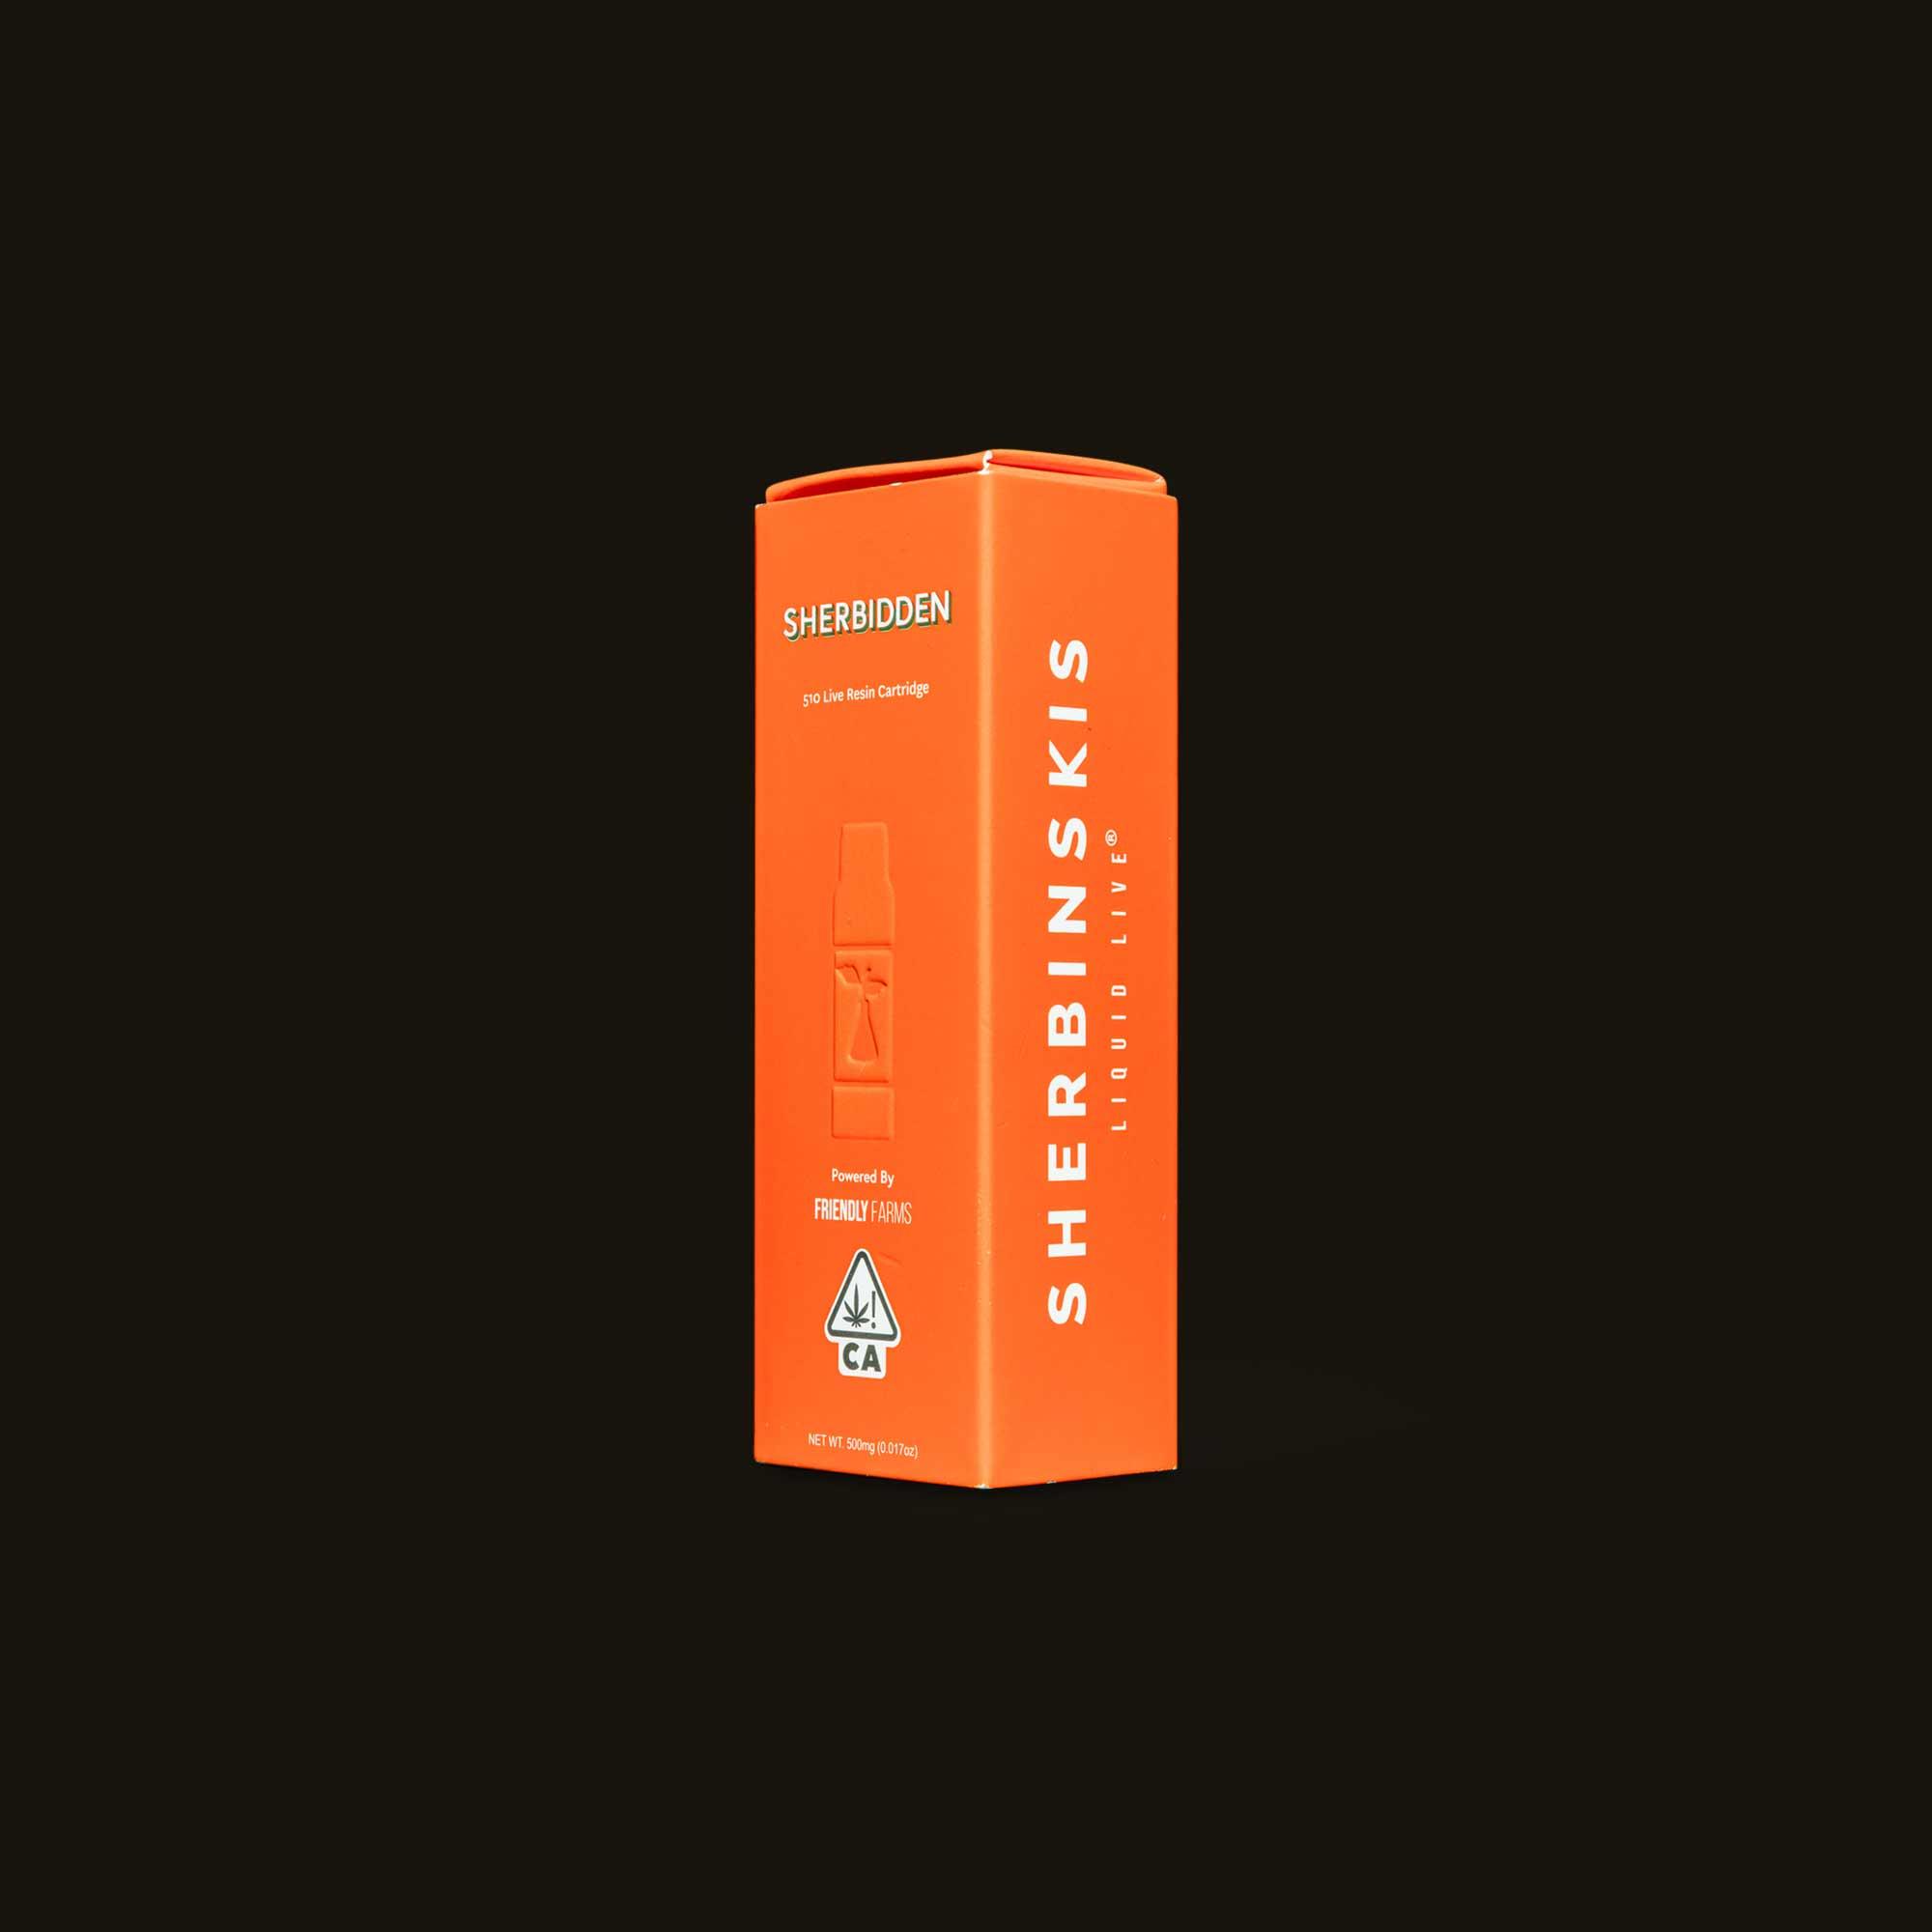 Sherbinskis Vape Pen - Sherbidden Live Resin Cartridge